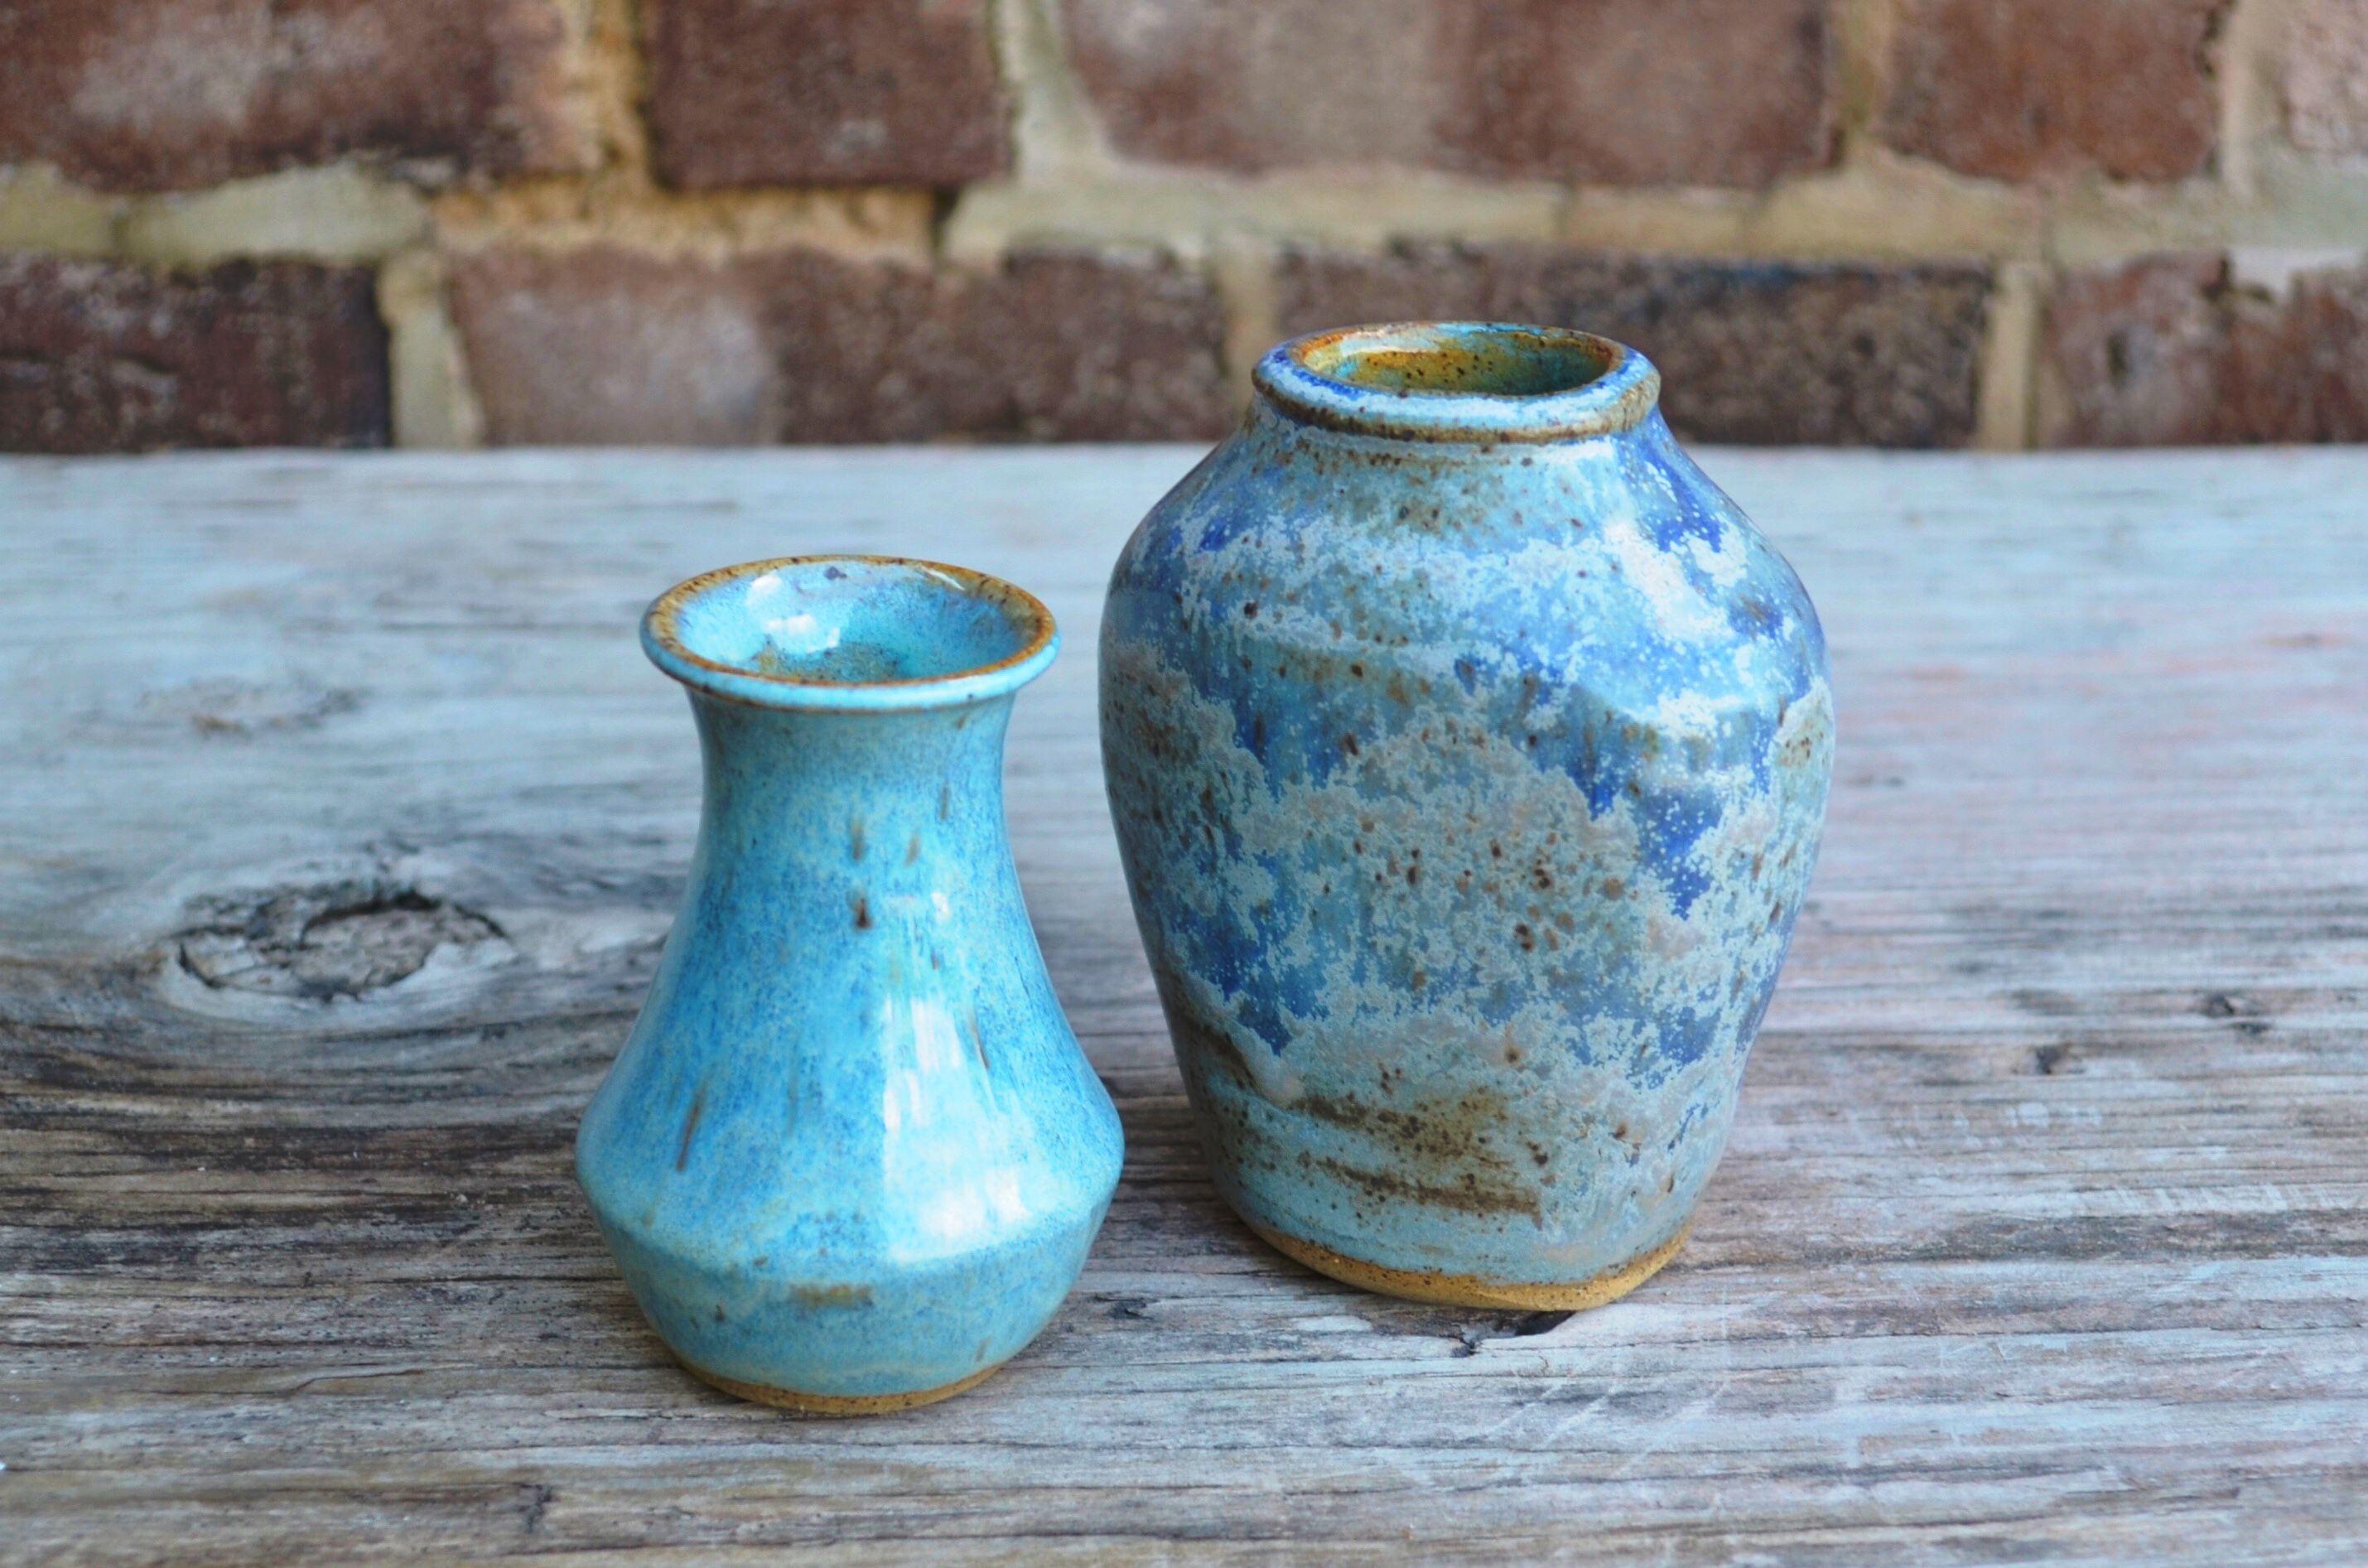 Pasceramics Coyote Glaze Glaze Clay Art Pottery